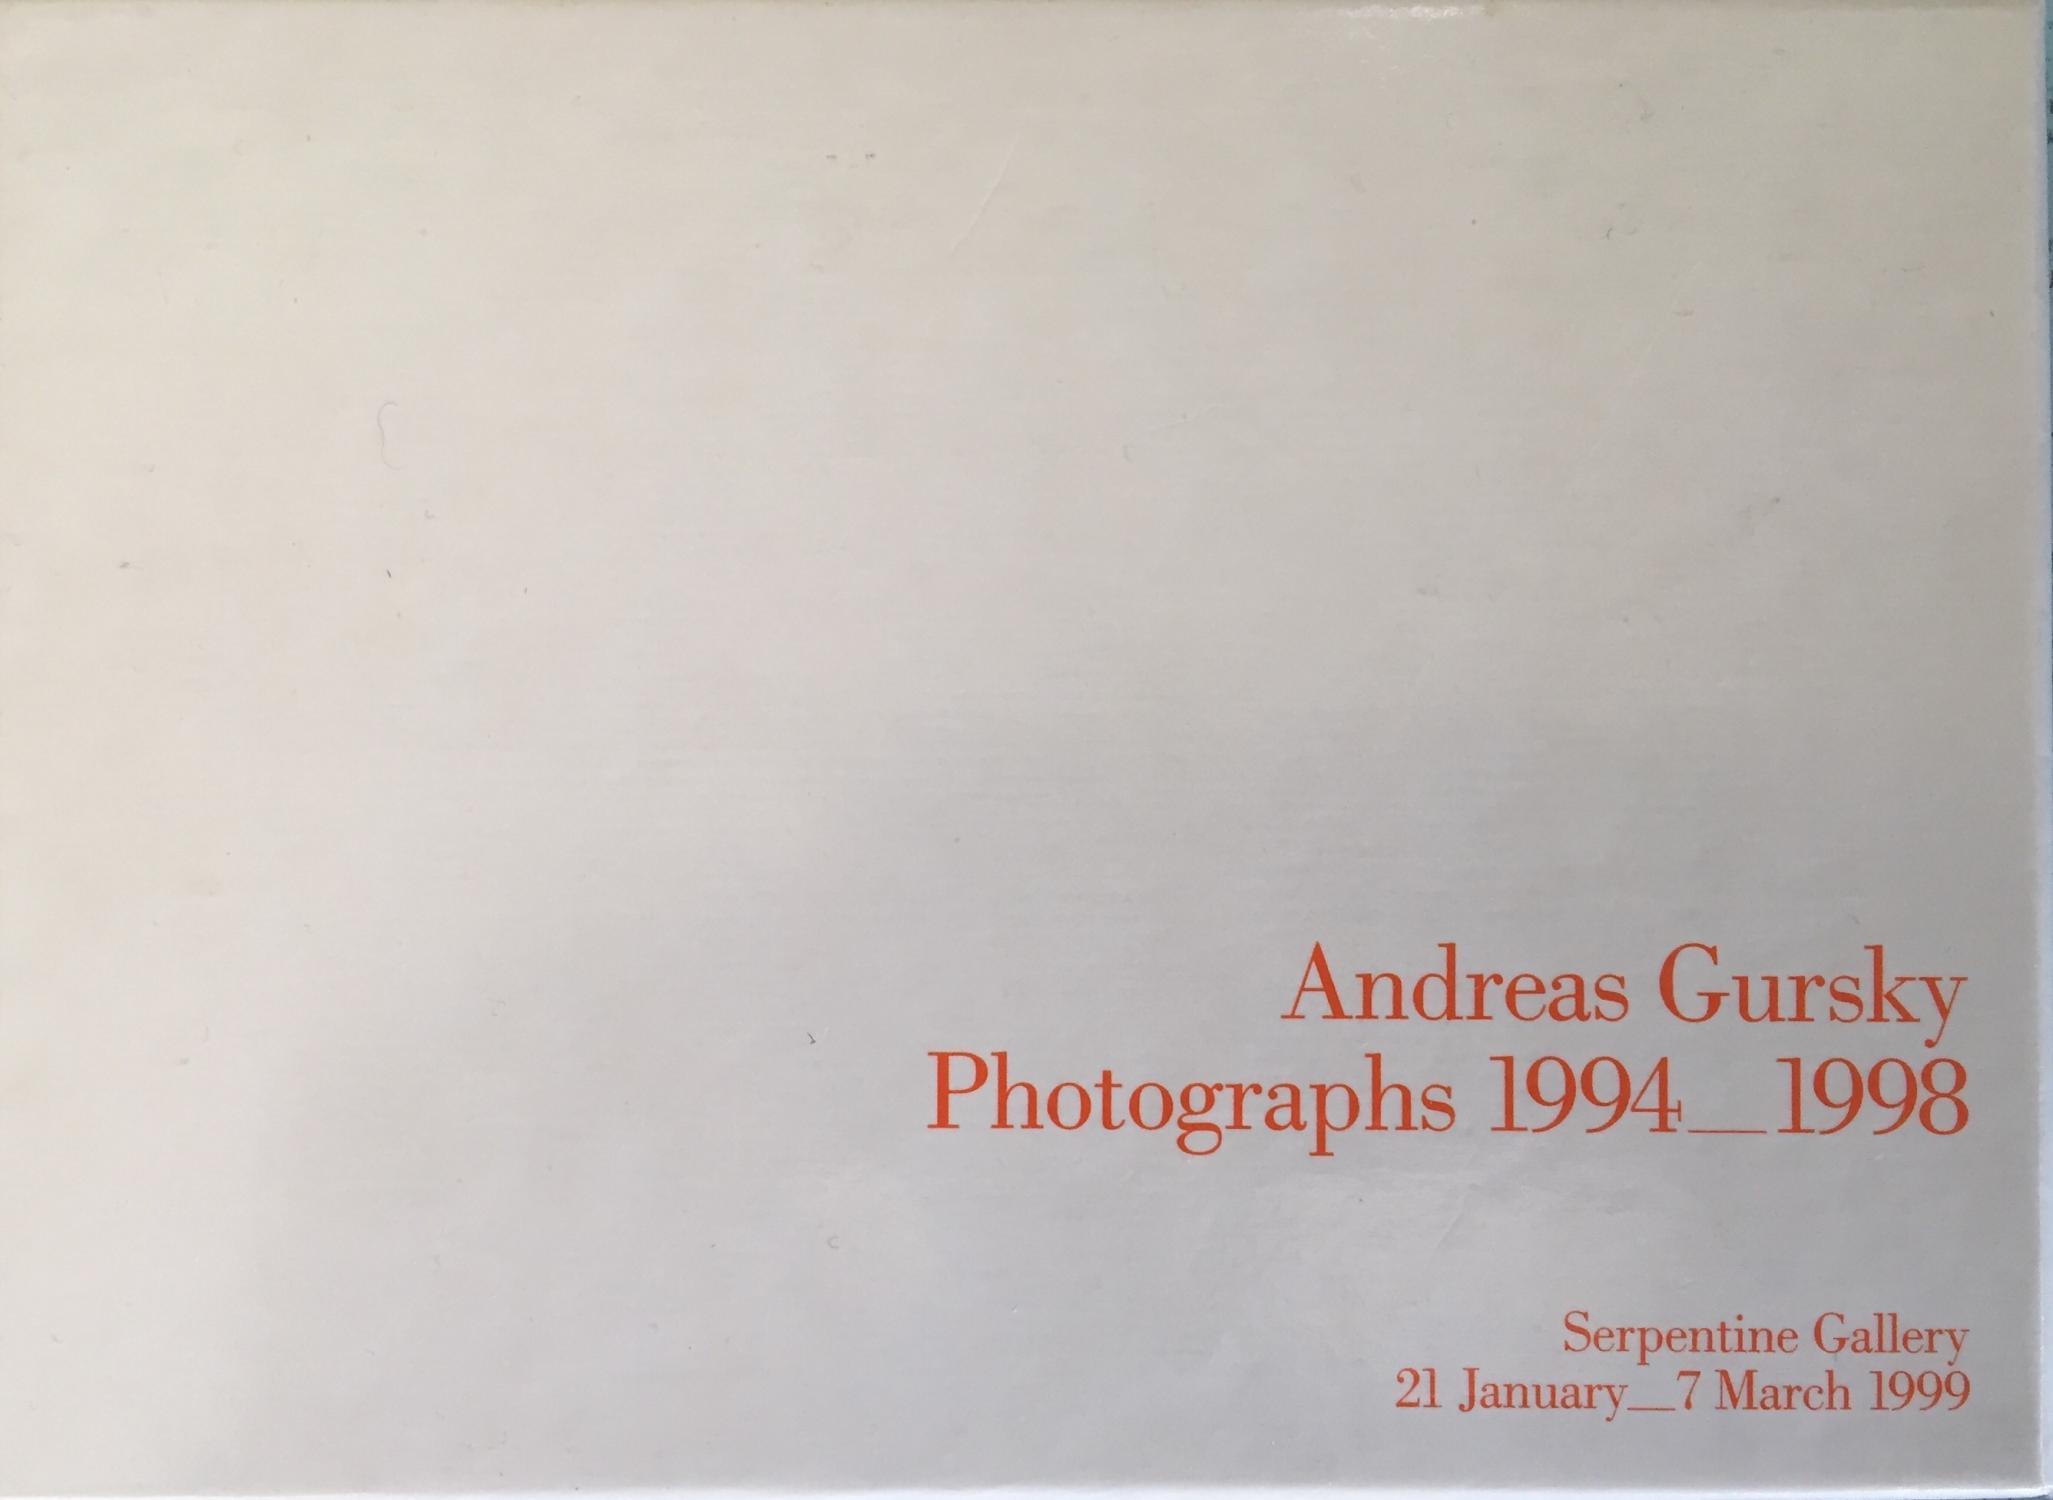 Photographs 1994_1998: Andreas Gursky